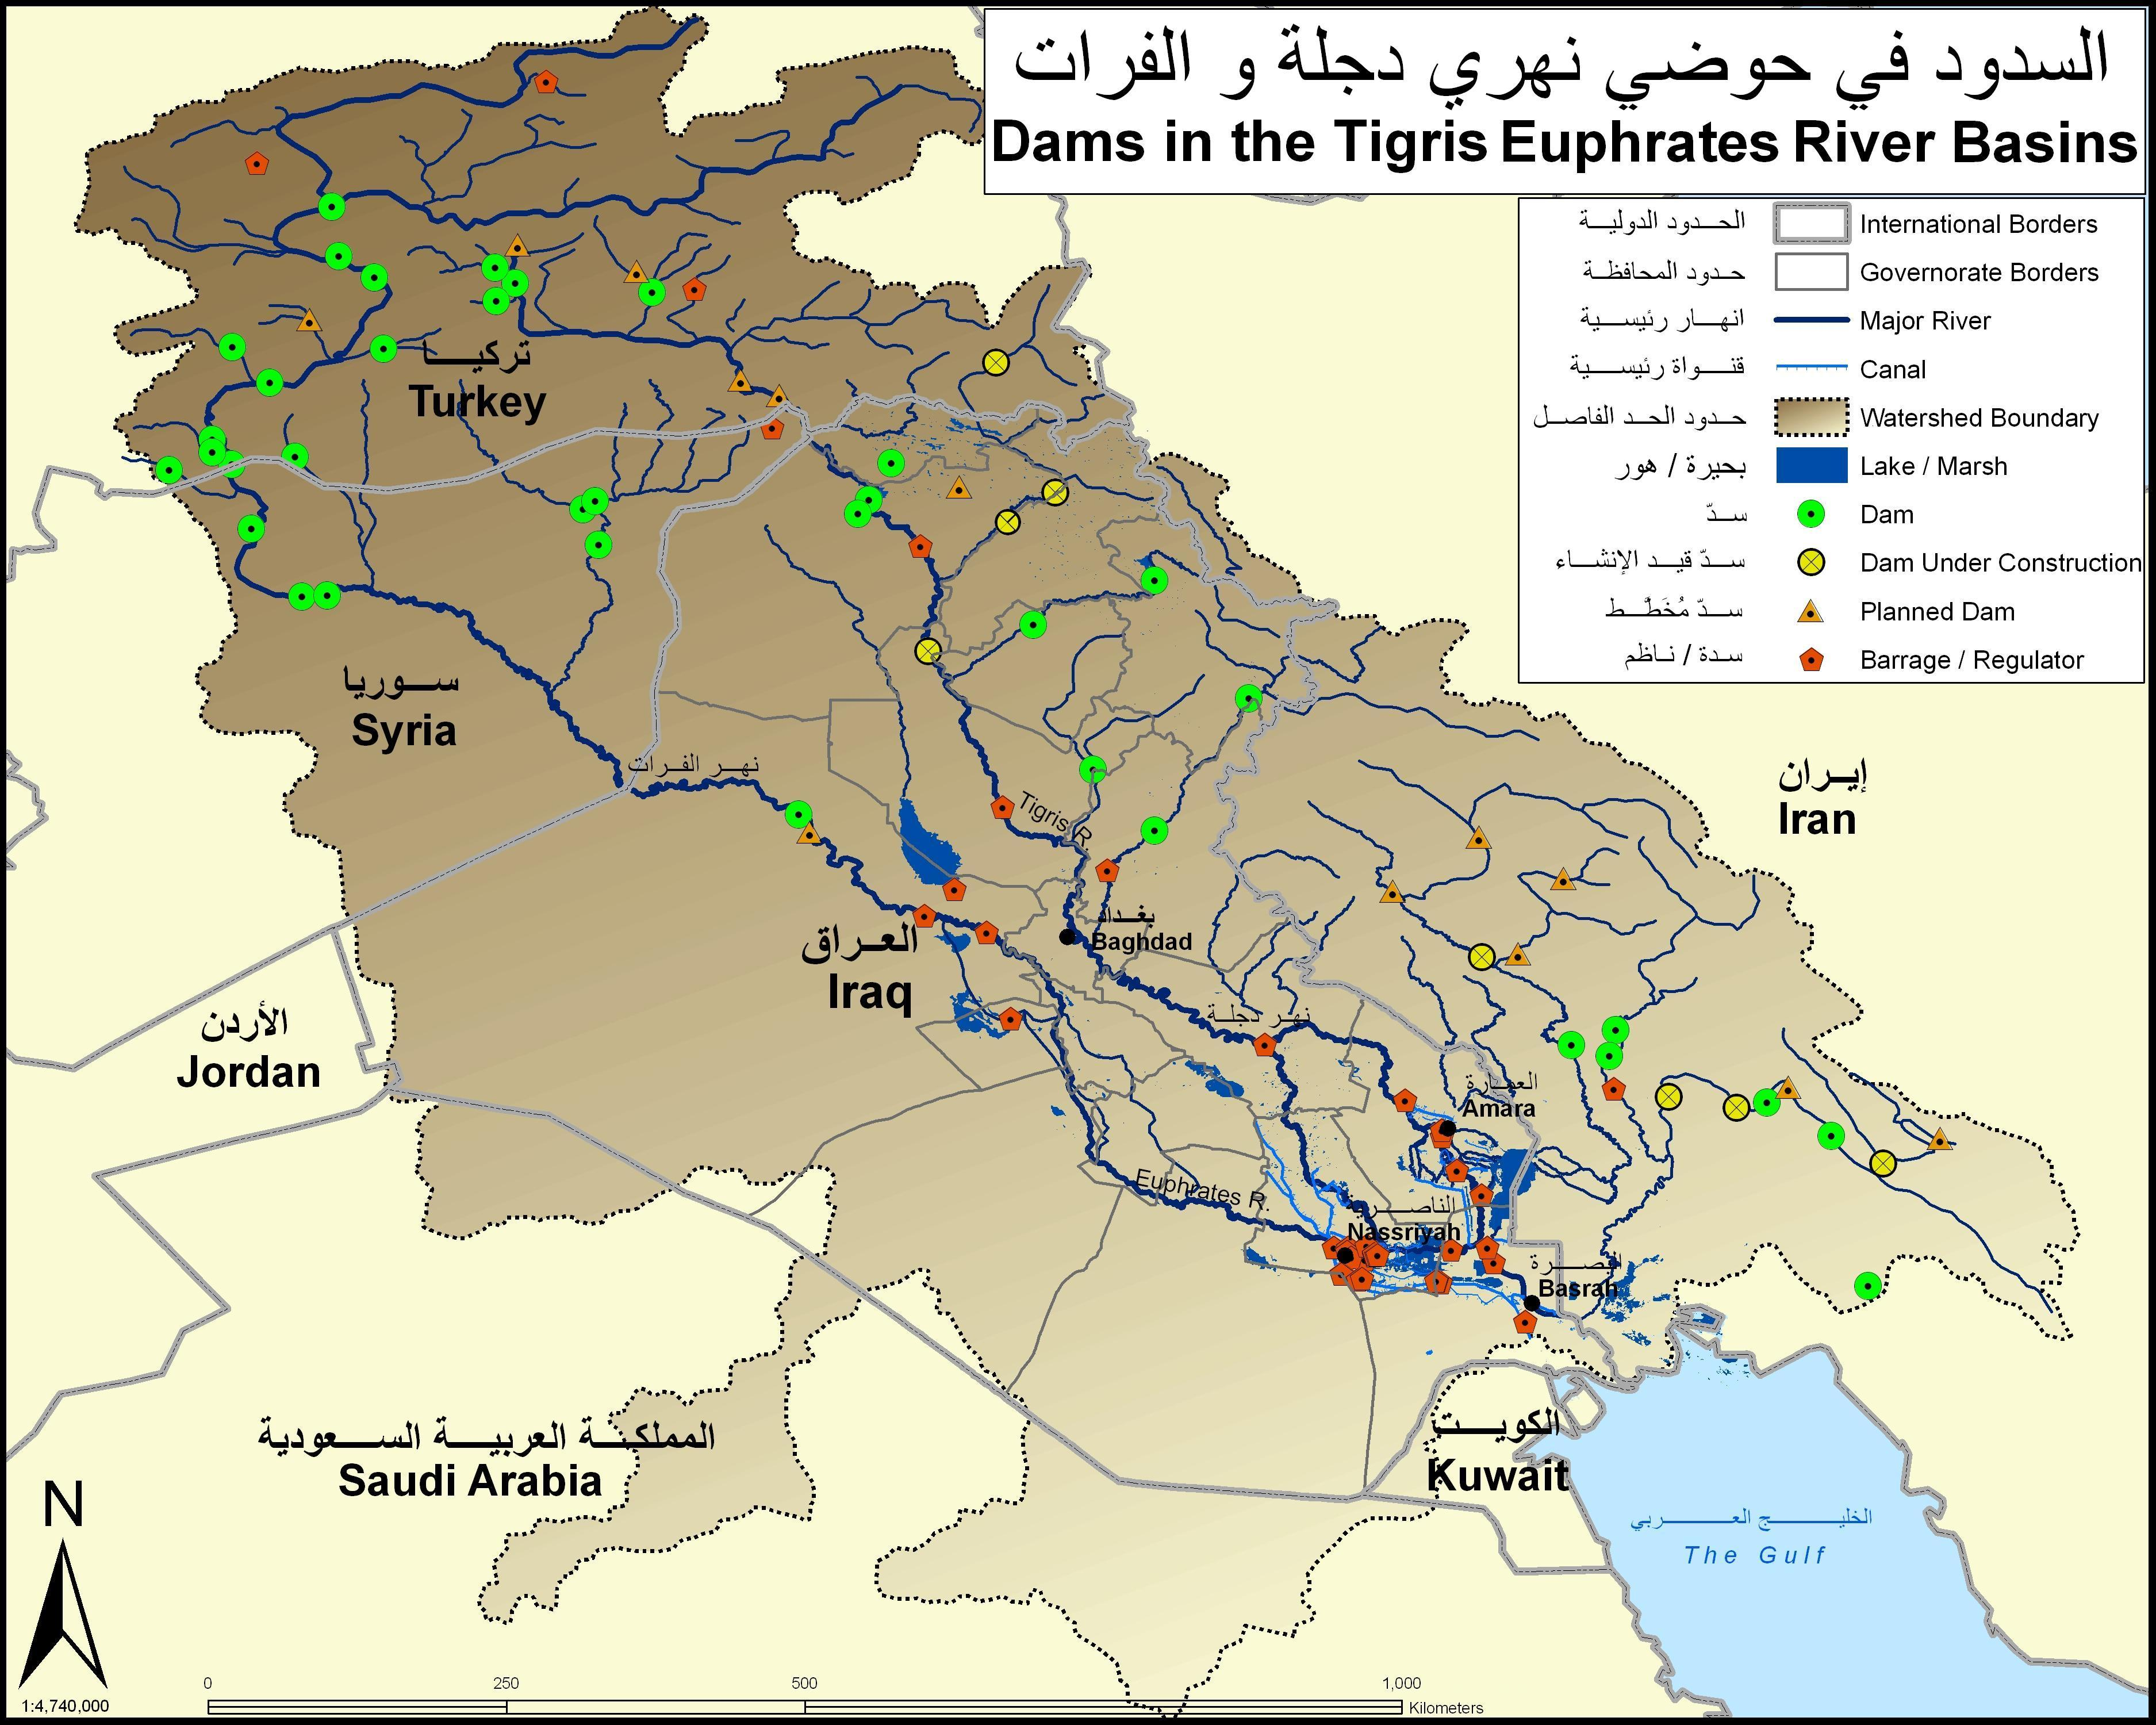 Dams in the Tigris Euphrates river basins